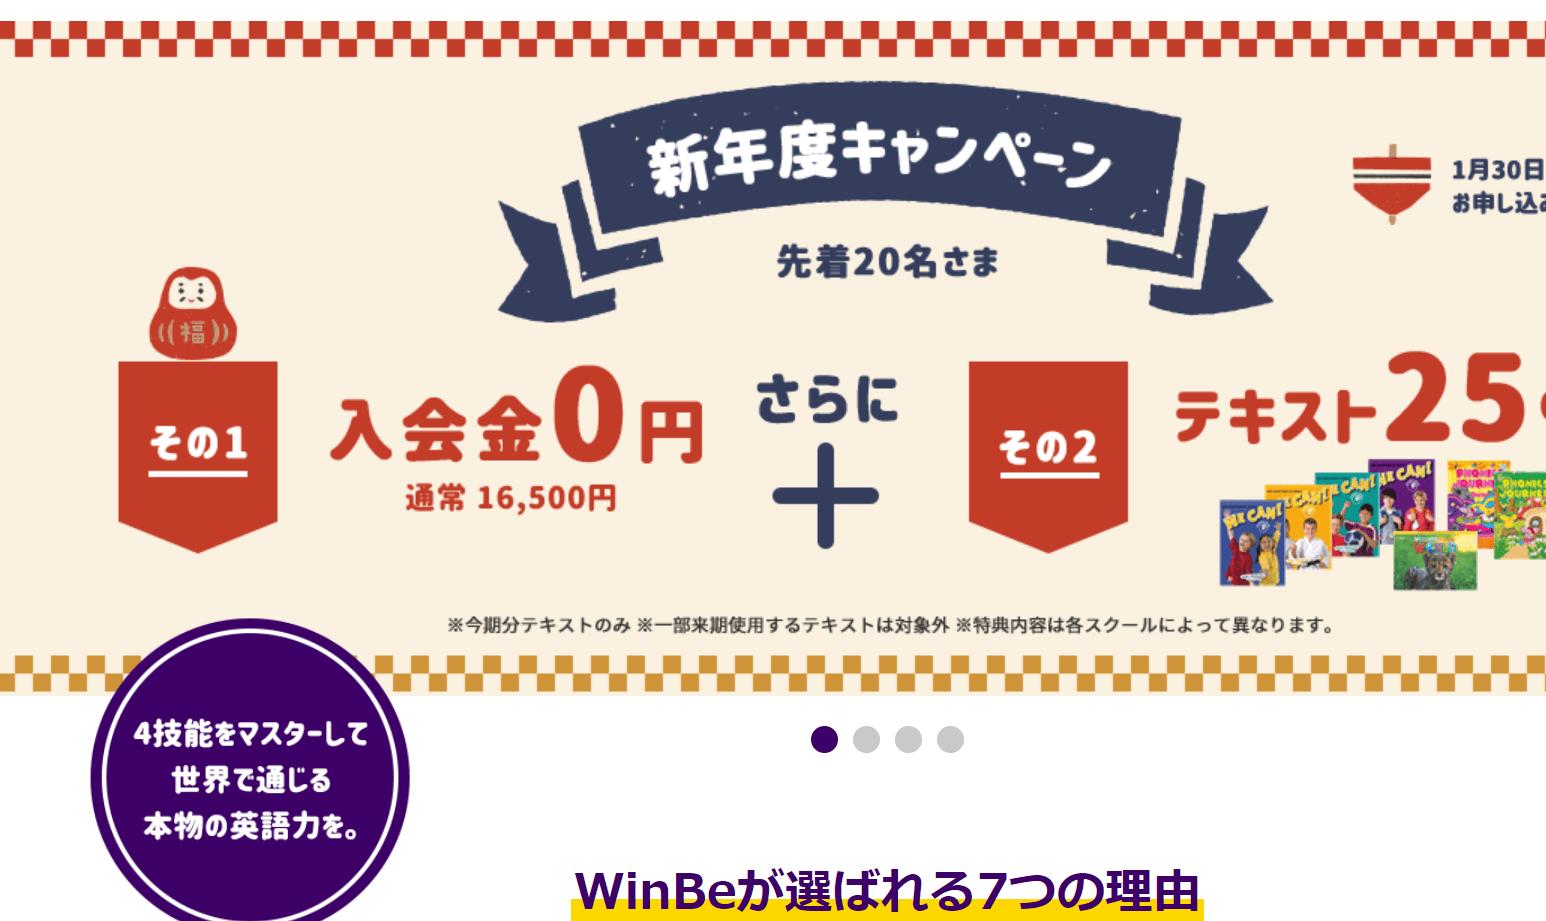 WinBe-キャンペーン